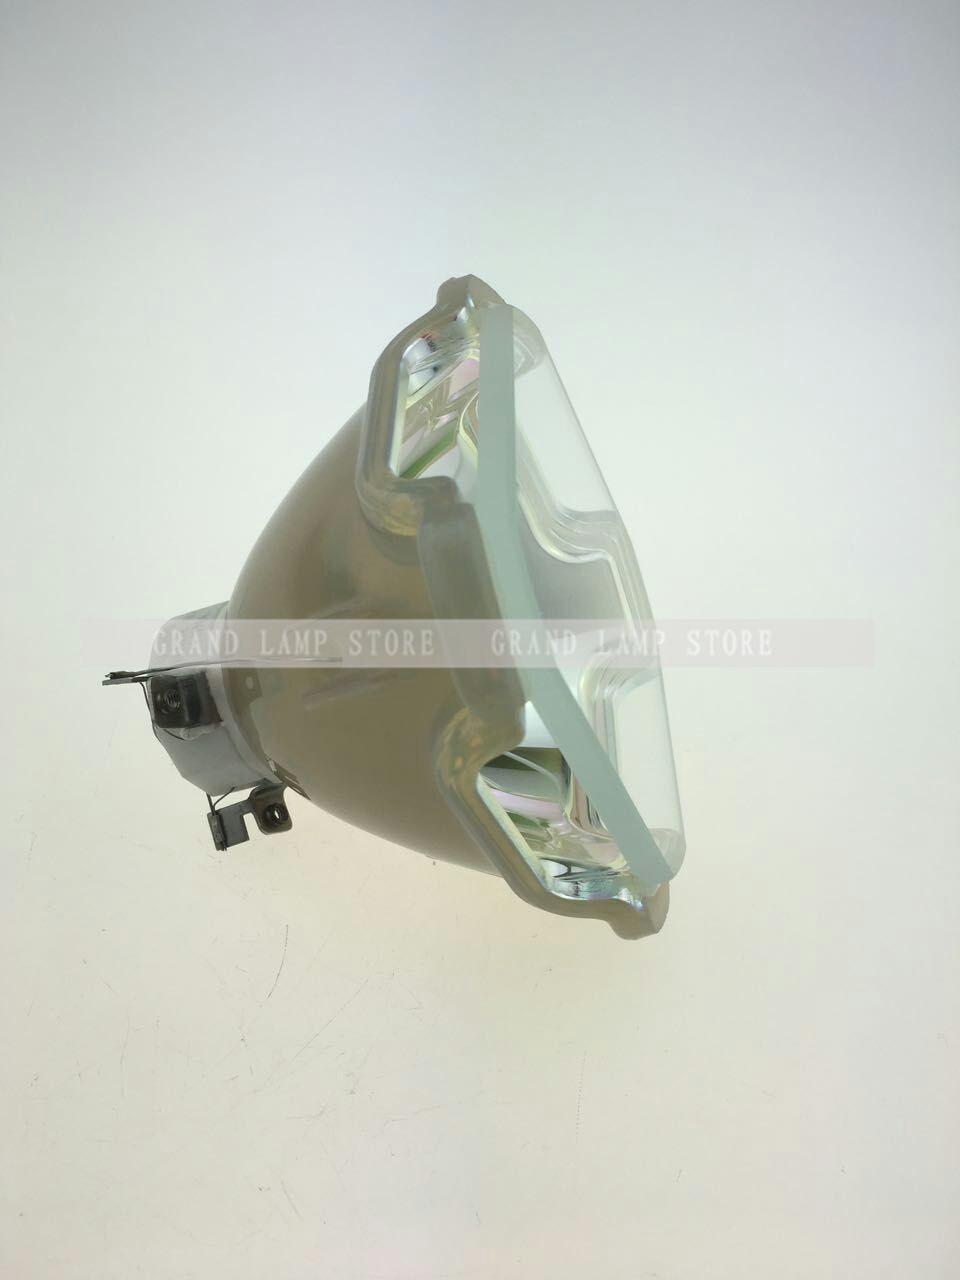 Reemplazo Original de la lámpara de bombilla desnuda LMP-F330 para los proyectores SON Y VPL-FX51, FX52, FX52L, VPL-FX52, VPL-FX52L, VPL-PX51. Happybate